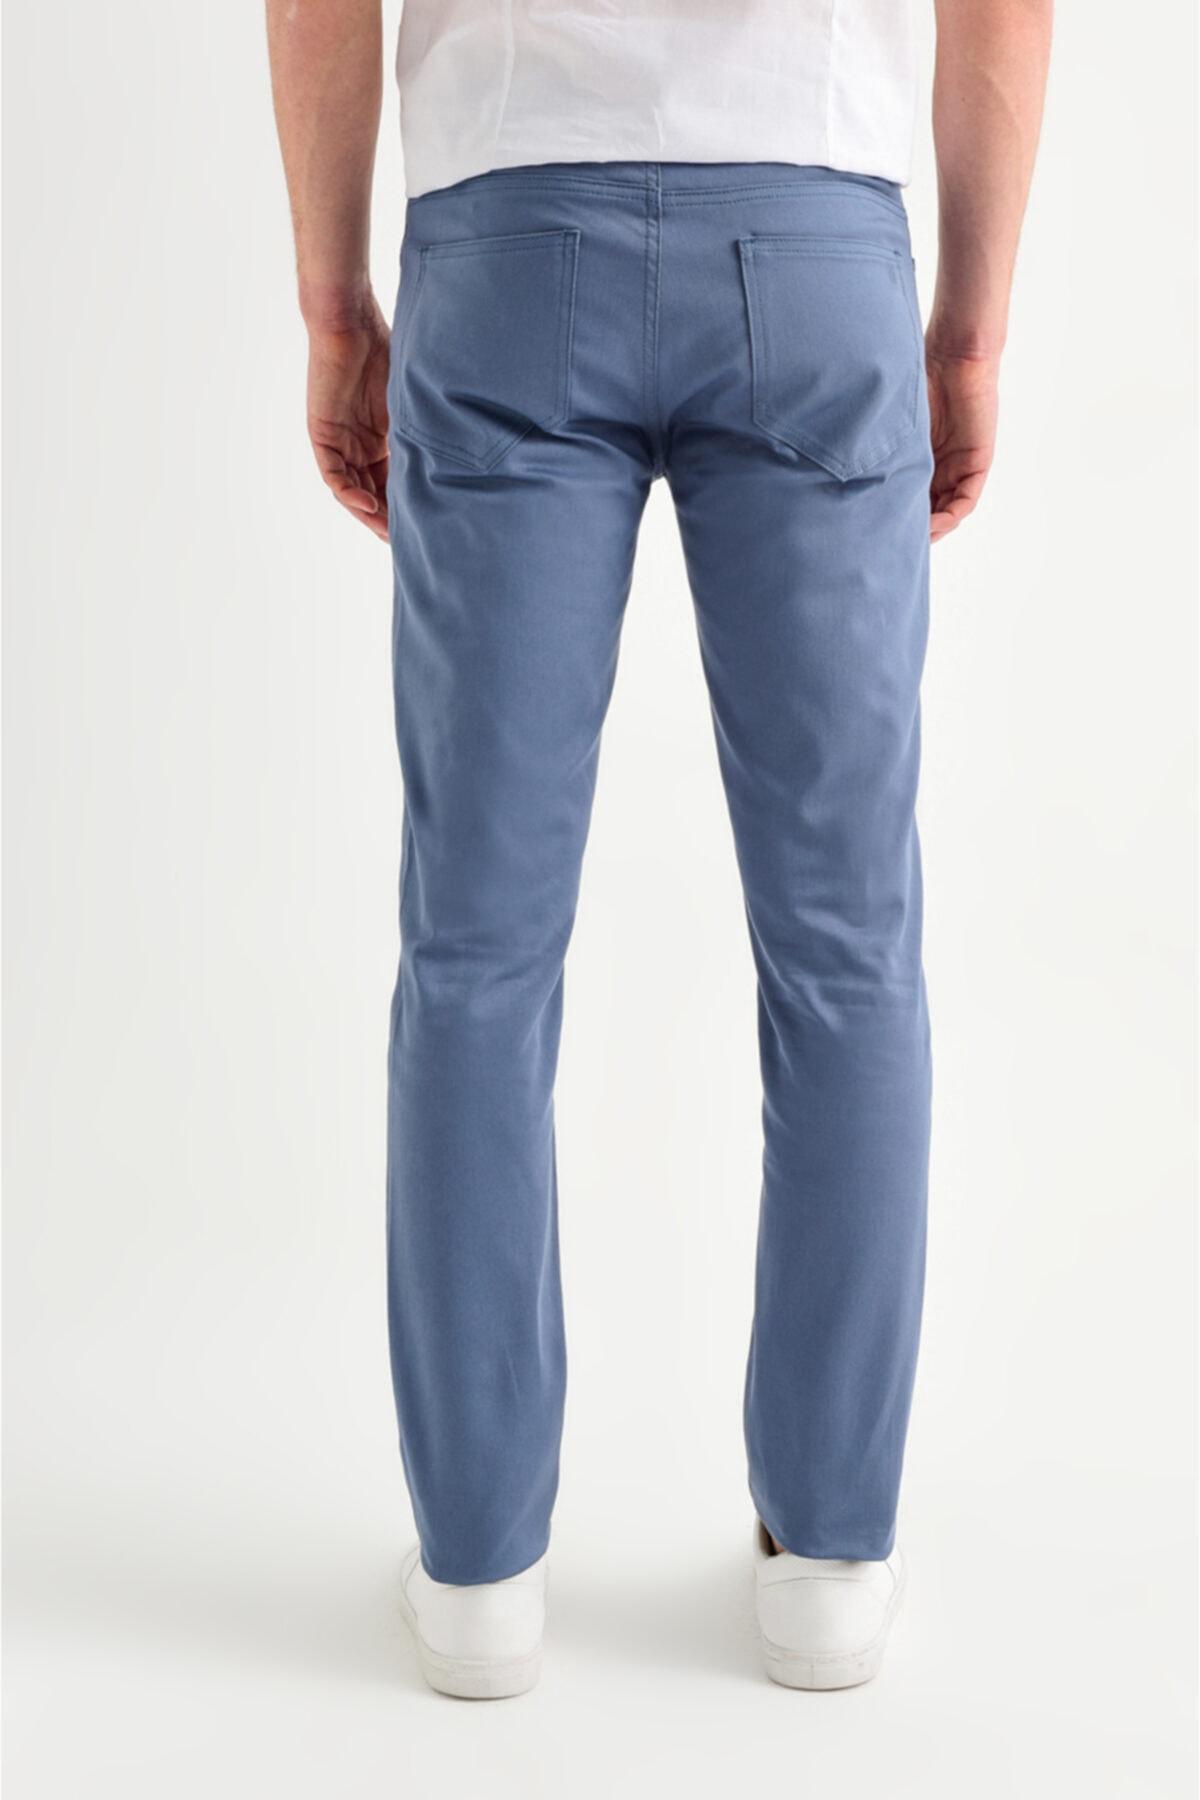 Avva Erkek Açık Mavi 5 Cepli Basic Slim Fit Pantolon A01y3041